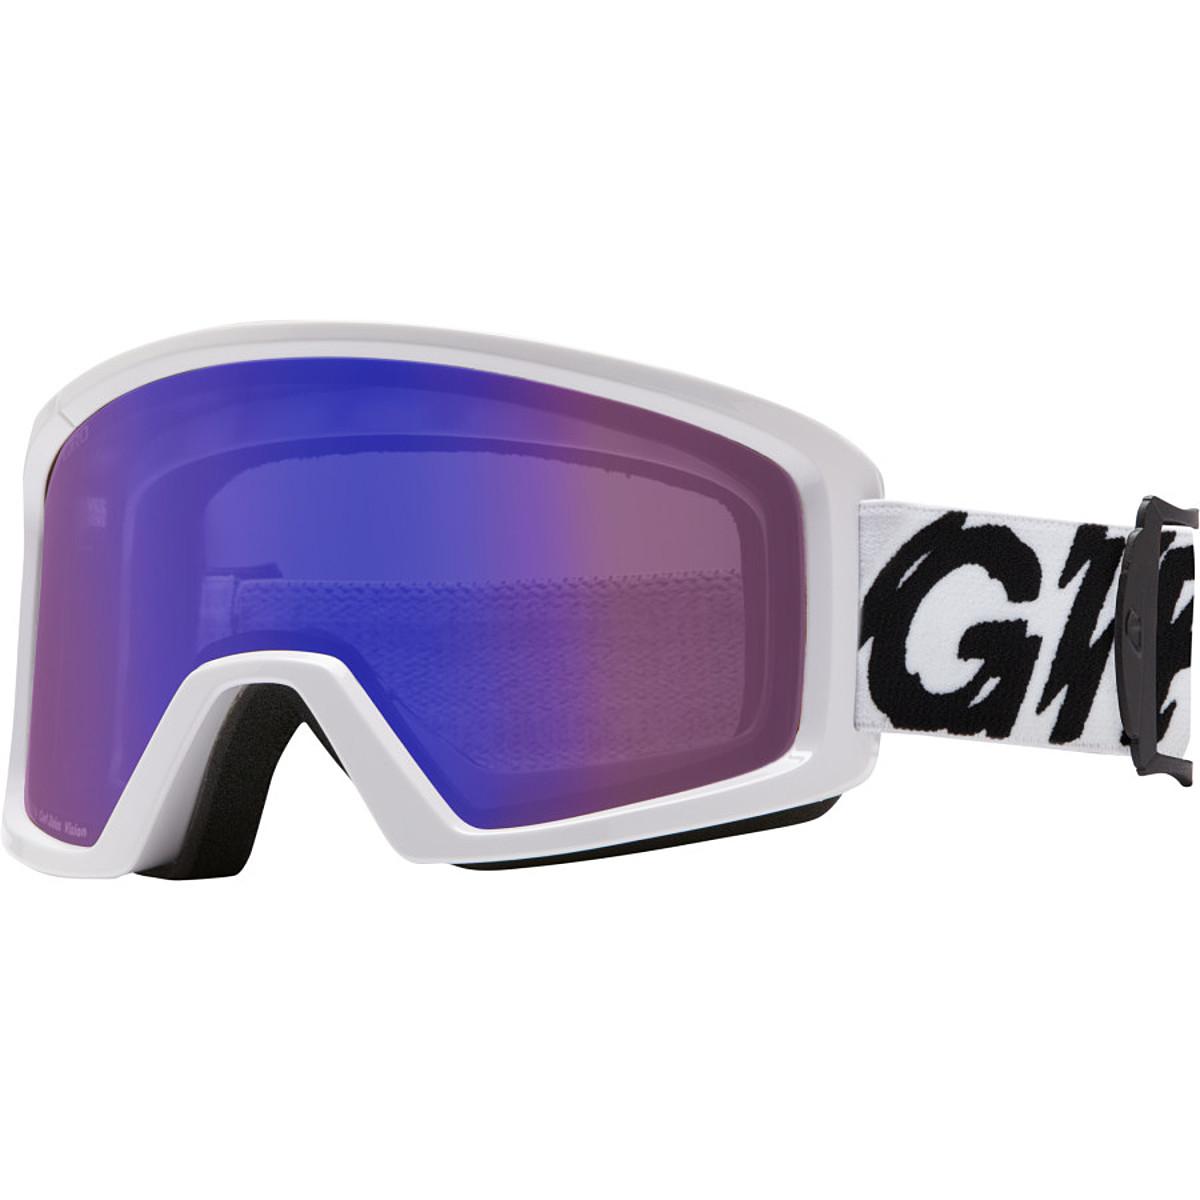 photo: Giro The Blok goggle